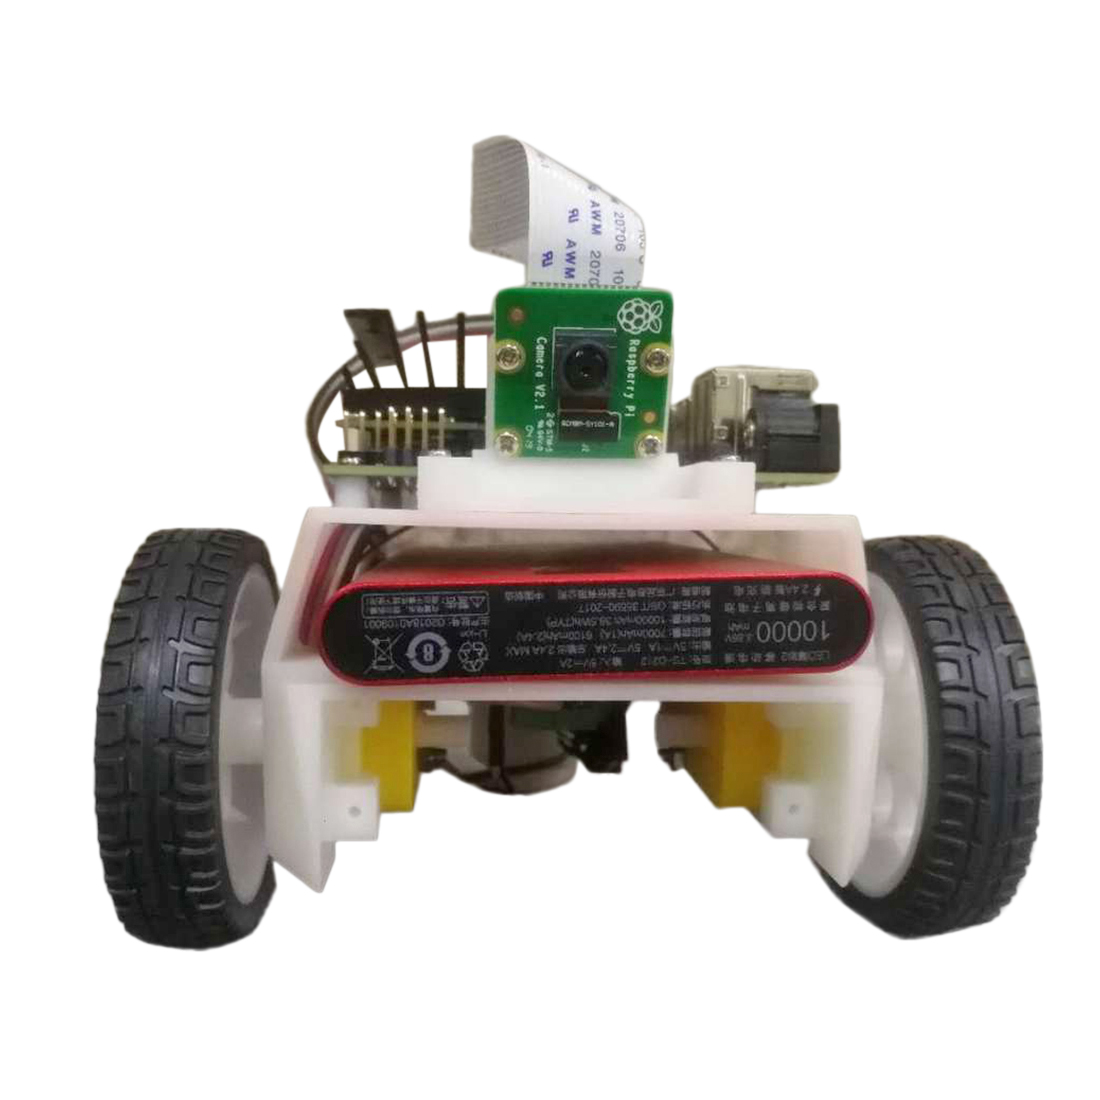 Programmable Automatic Drive Robot Car Kit Educational Learning Kit